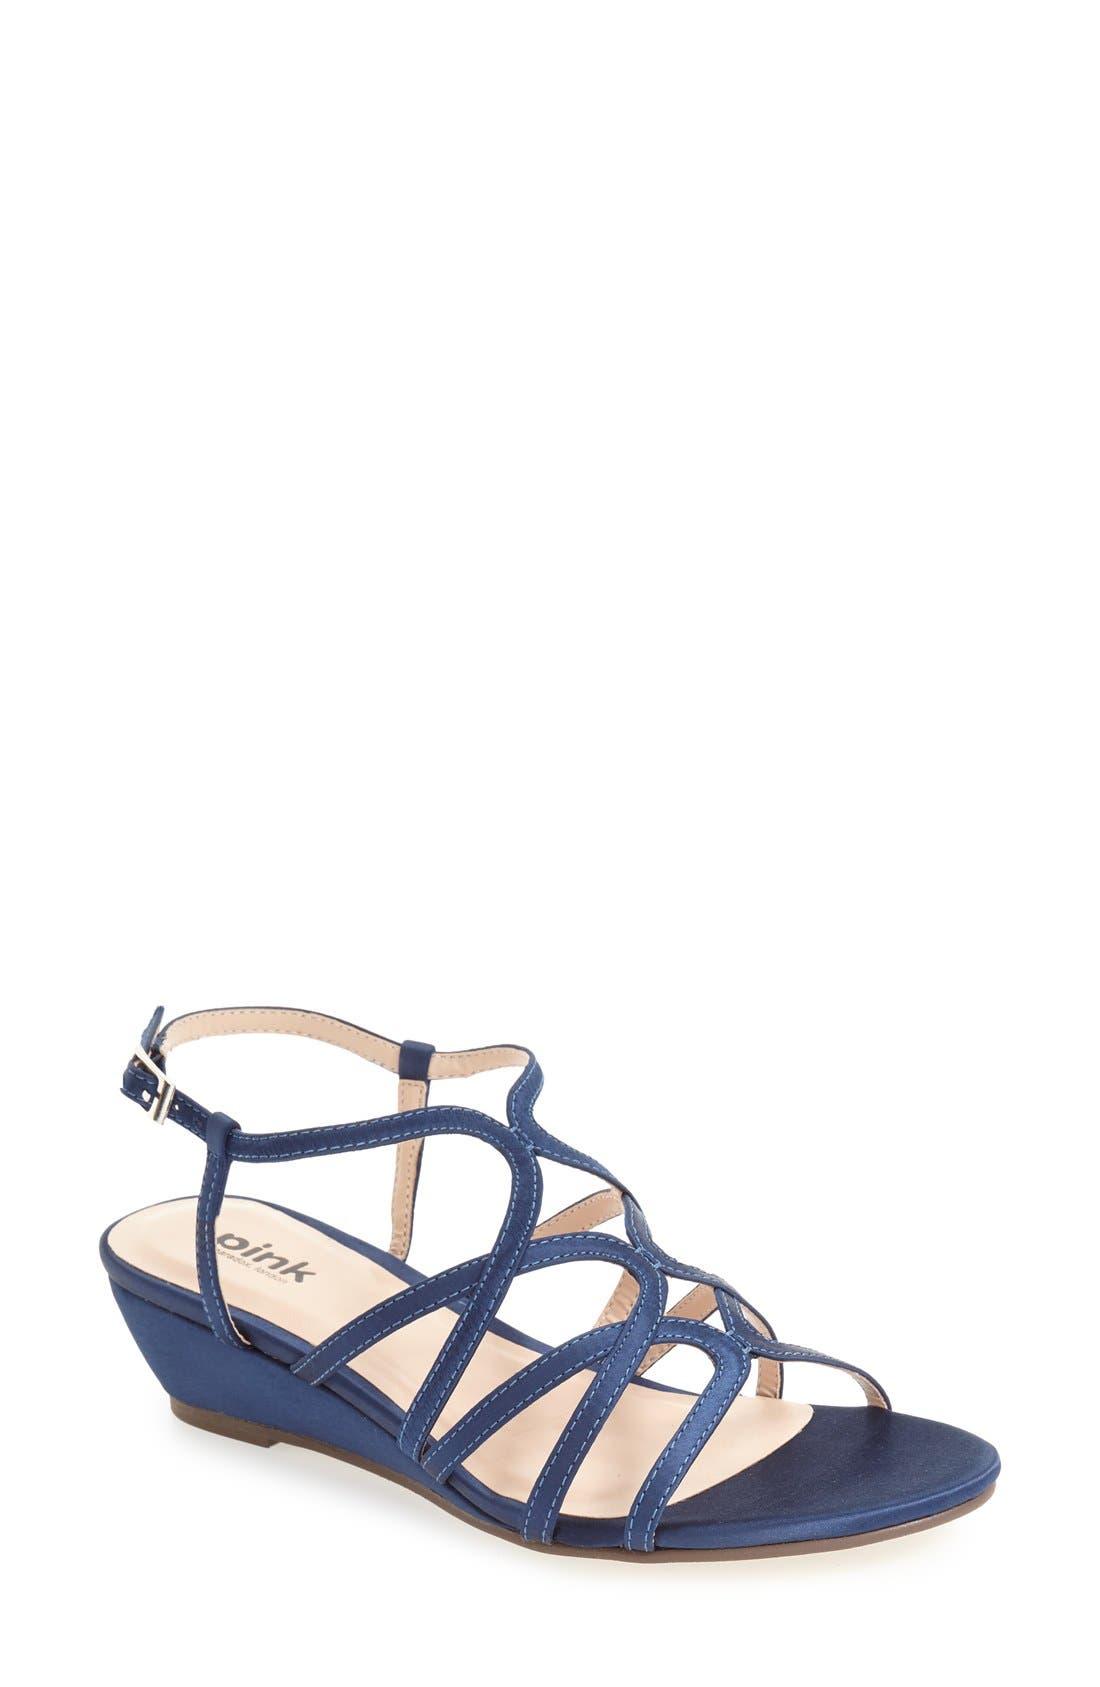 'Opulent' Wedge Sandal,                         Main,                         color, NAVY